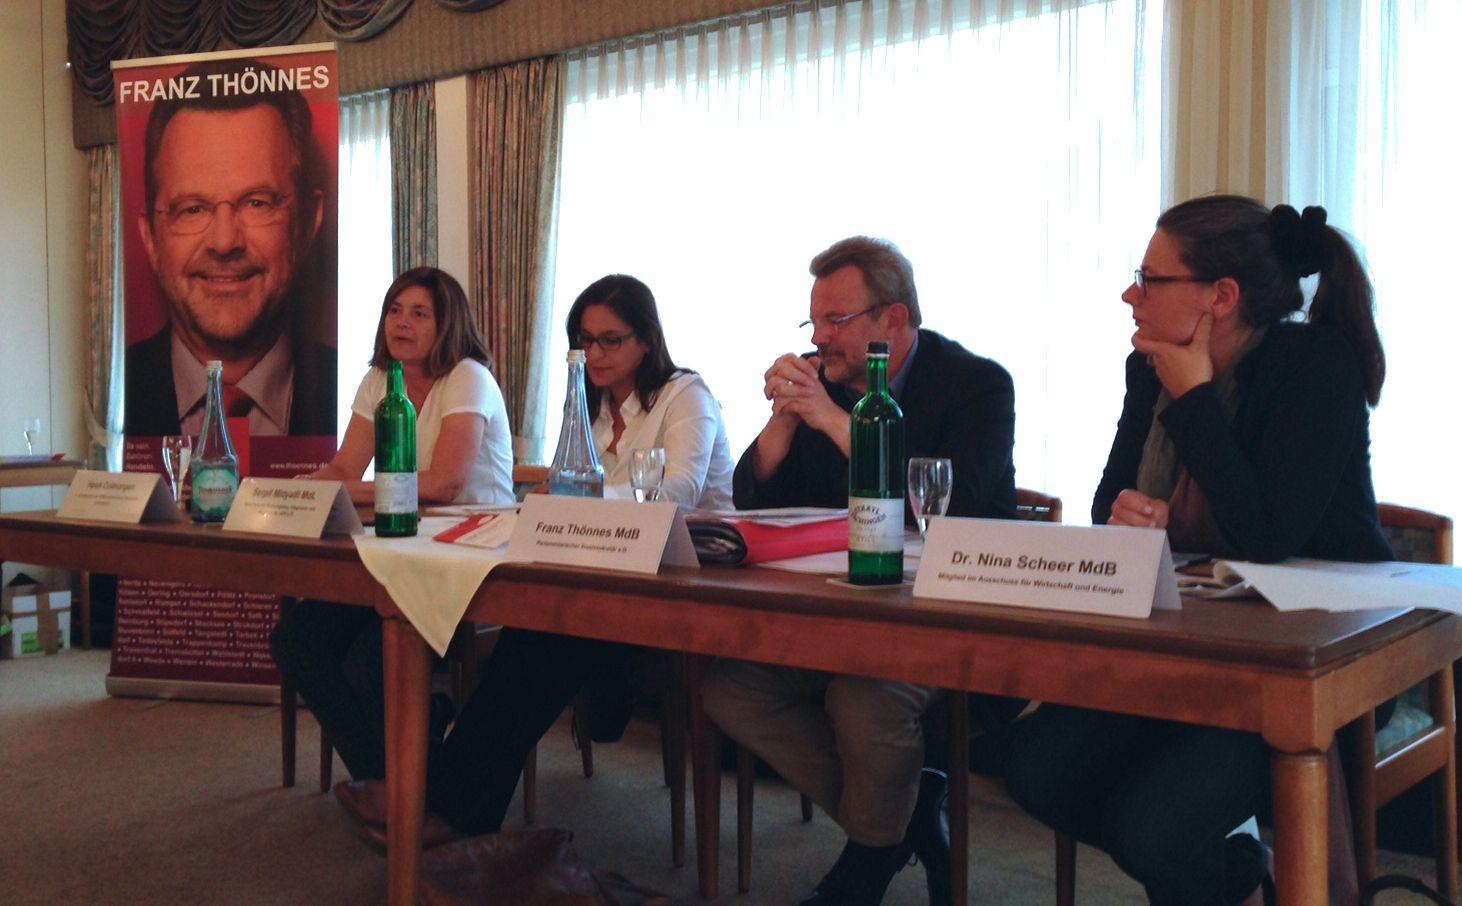 (v.l.n.r.): Heidi Colmorgen (1. Vorsitzende Willkommens-Team Henstedt-Ulzburg), SPD-MdL Serpil Midyatli, SPD-MdB Franz Thönnes und SPD-MdB Dr. Nina Scheer.